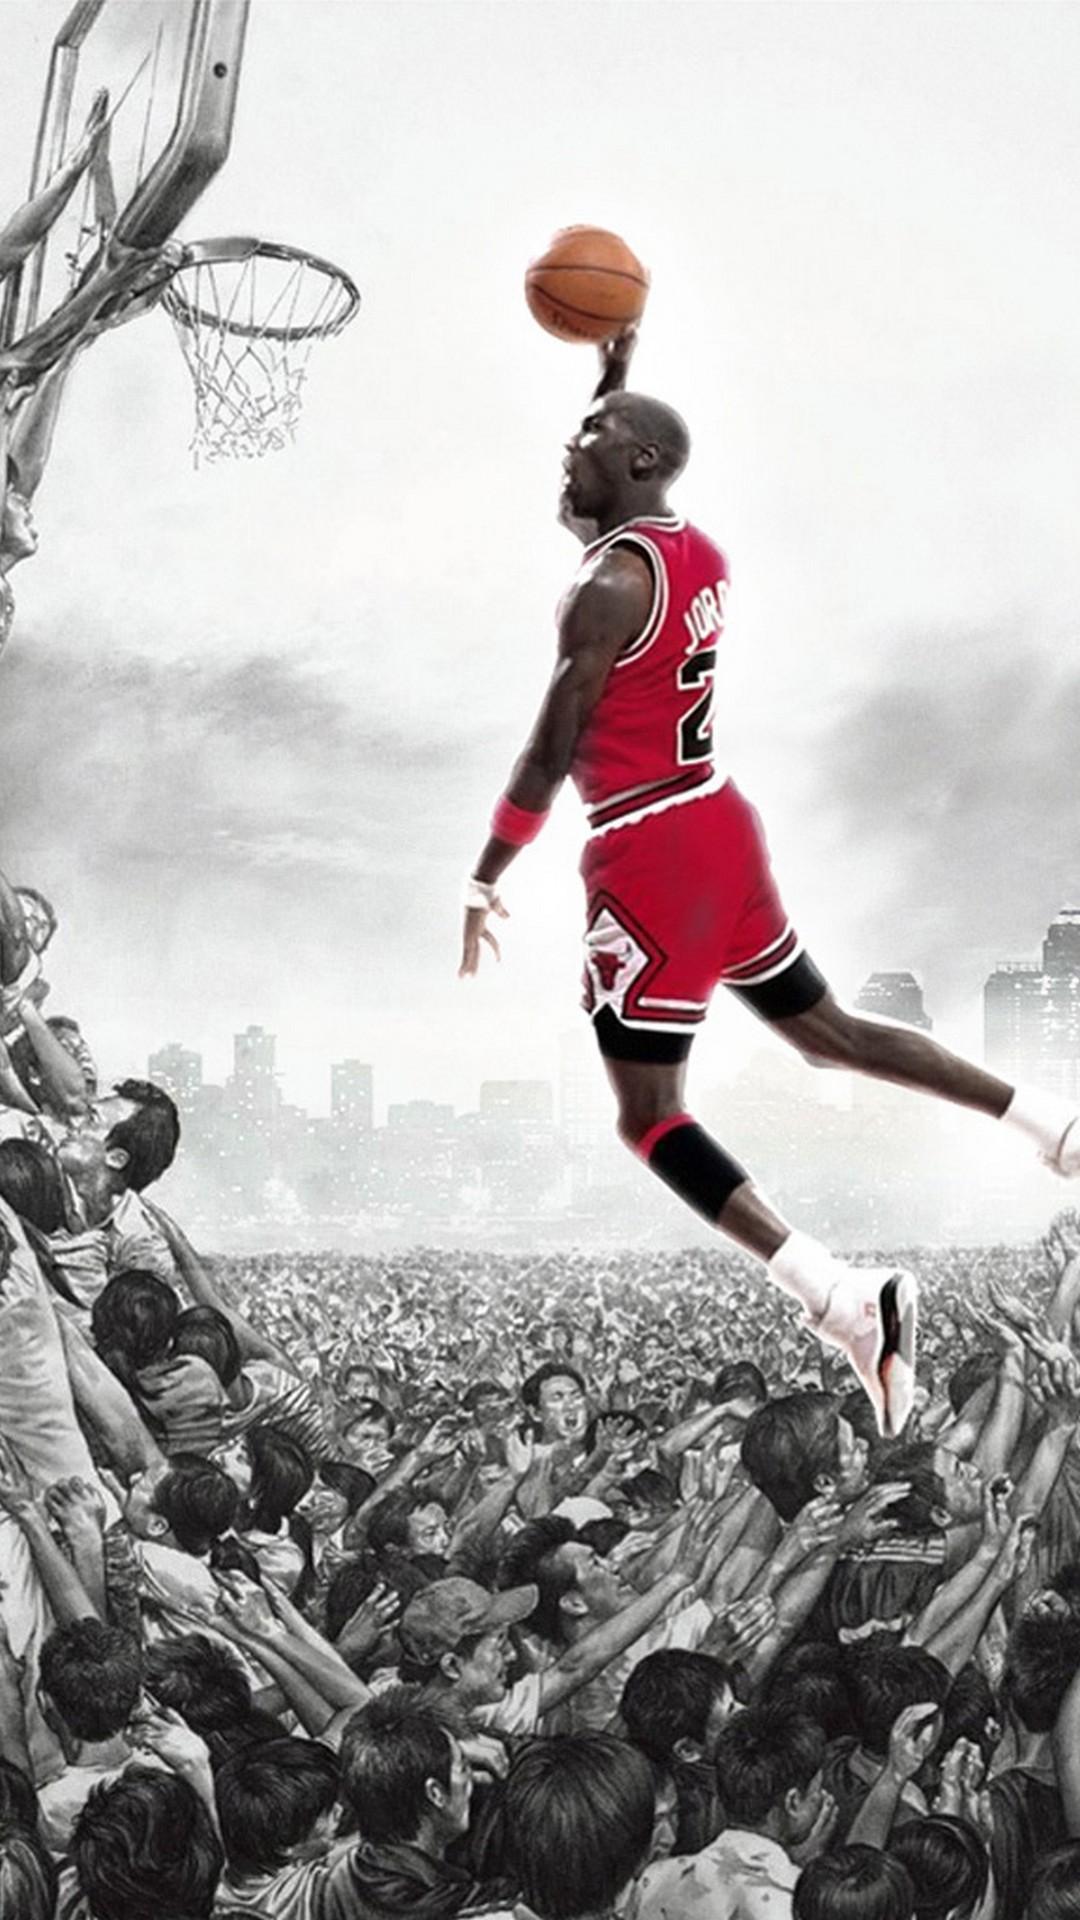 Basketball Games iPhone 7 Plus Wallpaper 2020 Basketball Wallpaper 1080x1920